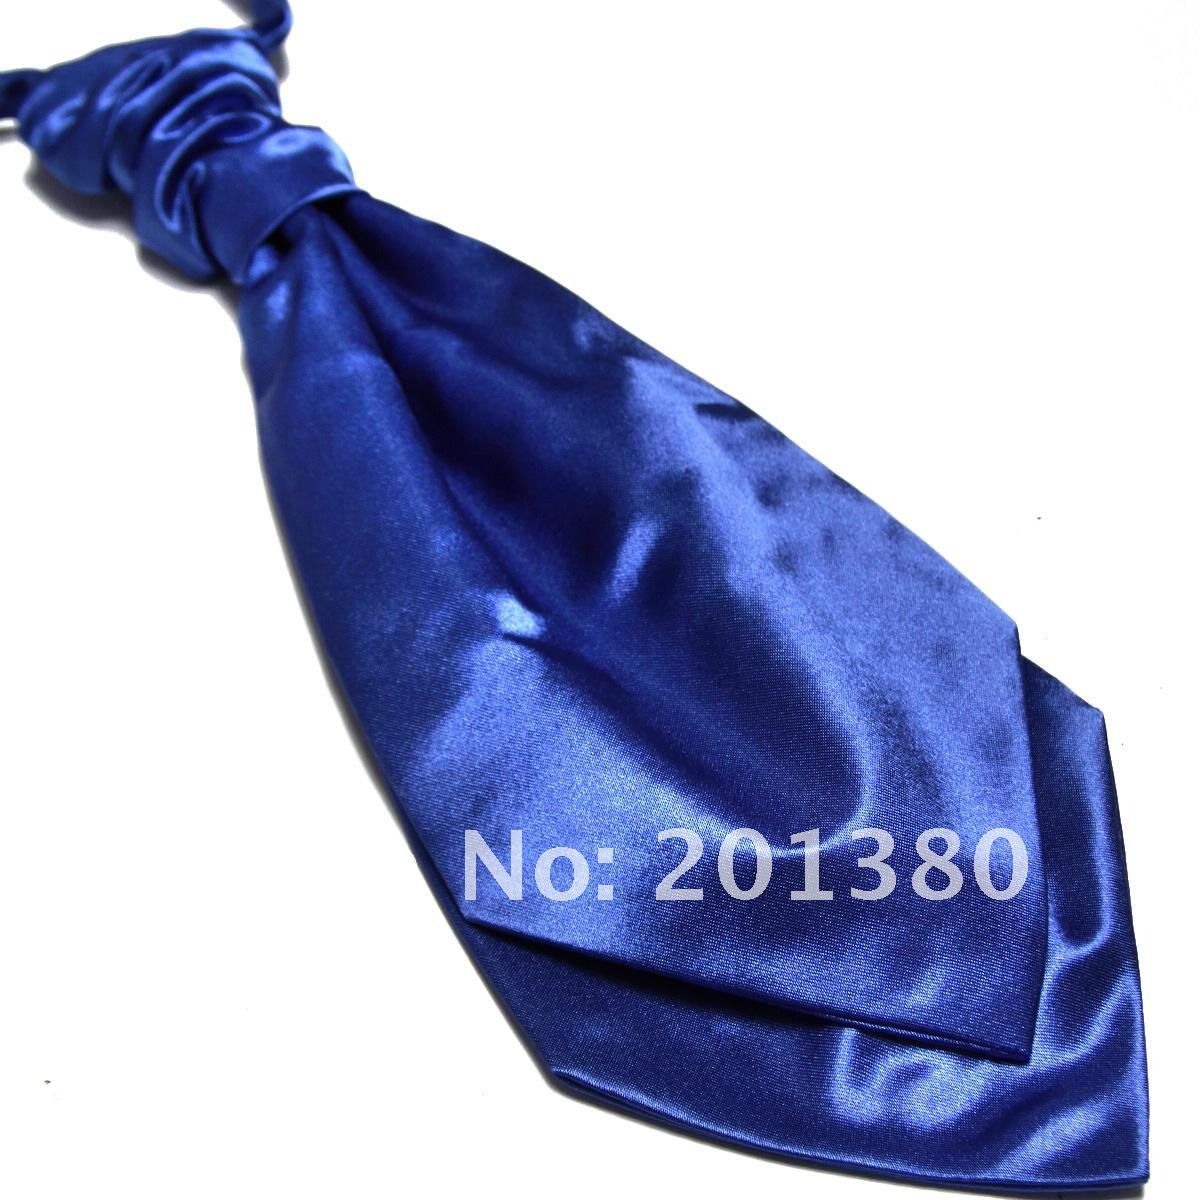 2019 laços para homens gravata cor sólida gravata ascot cópia do casamento seda cor sólida moda poliéster gravata gravata